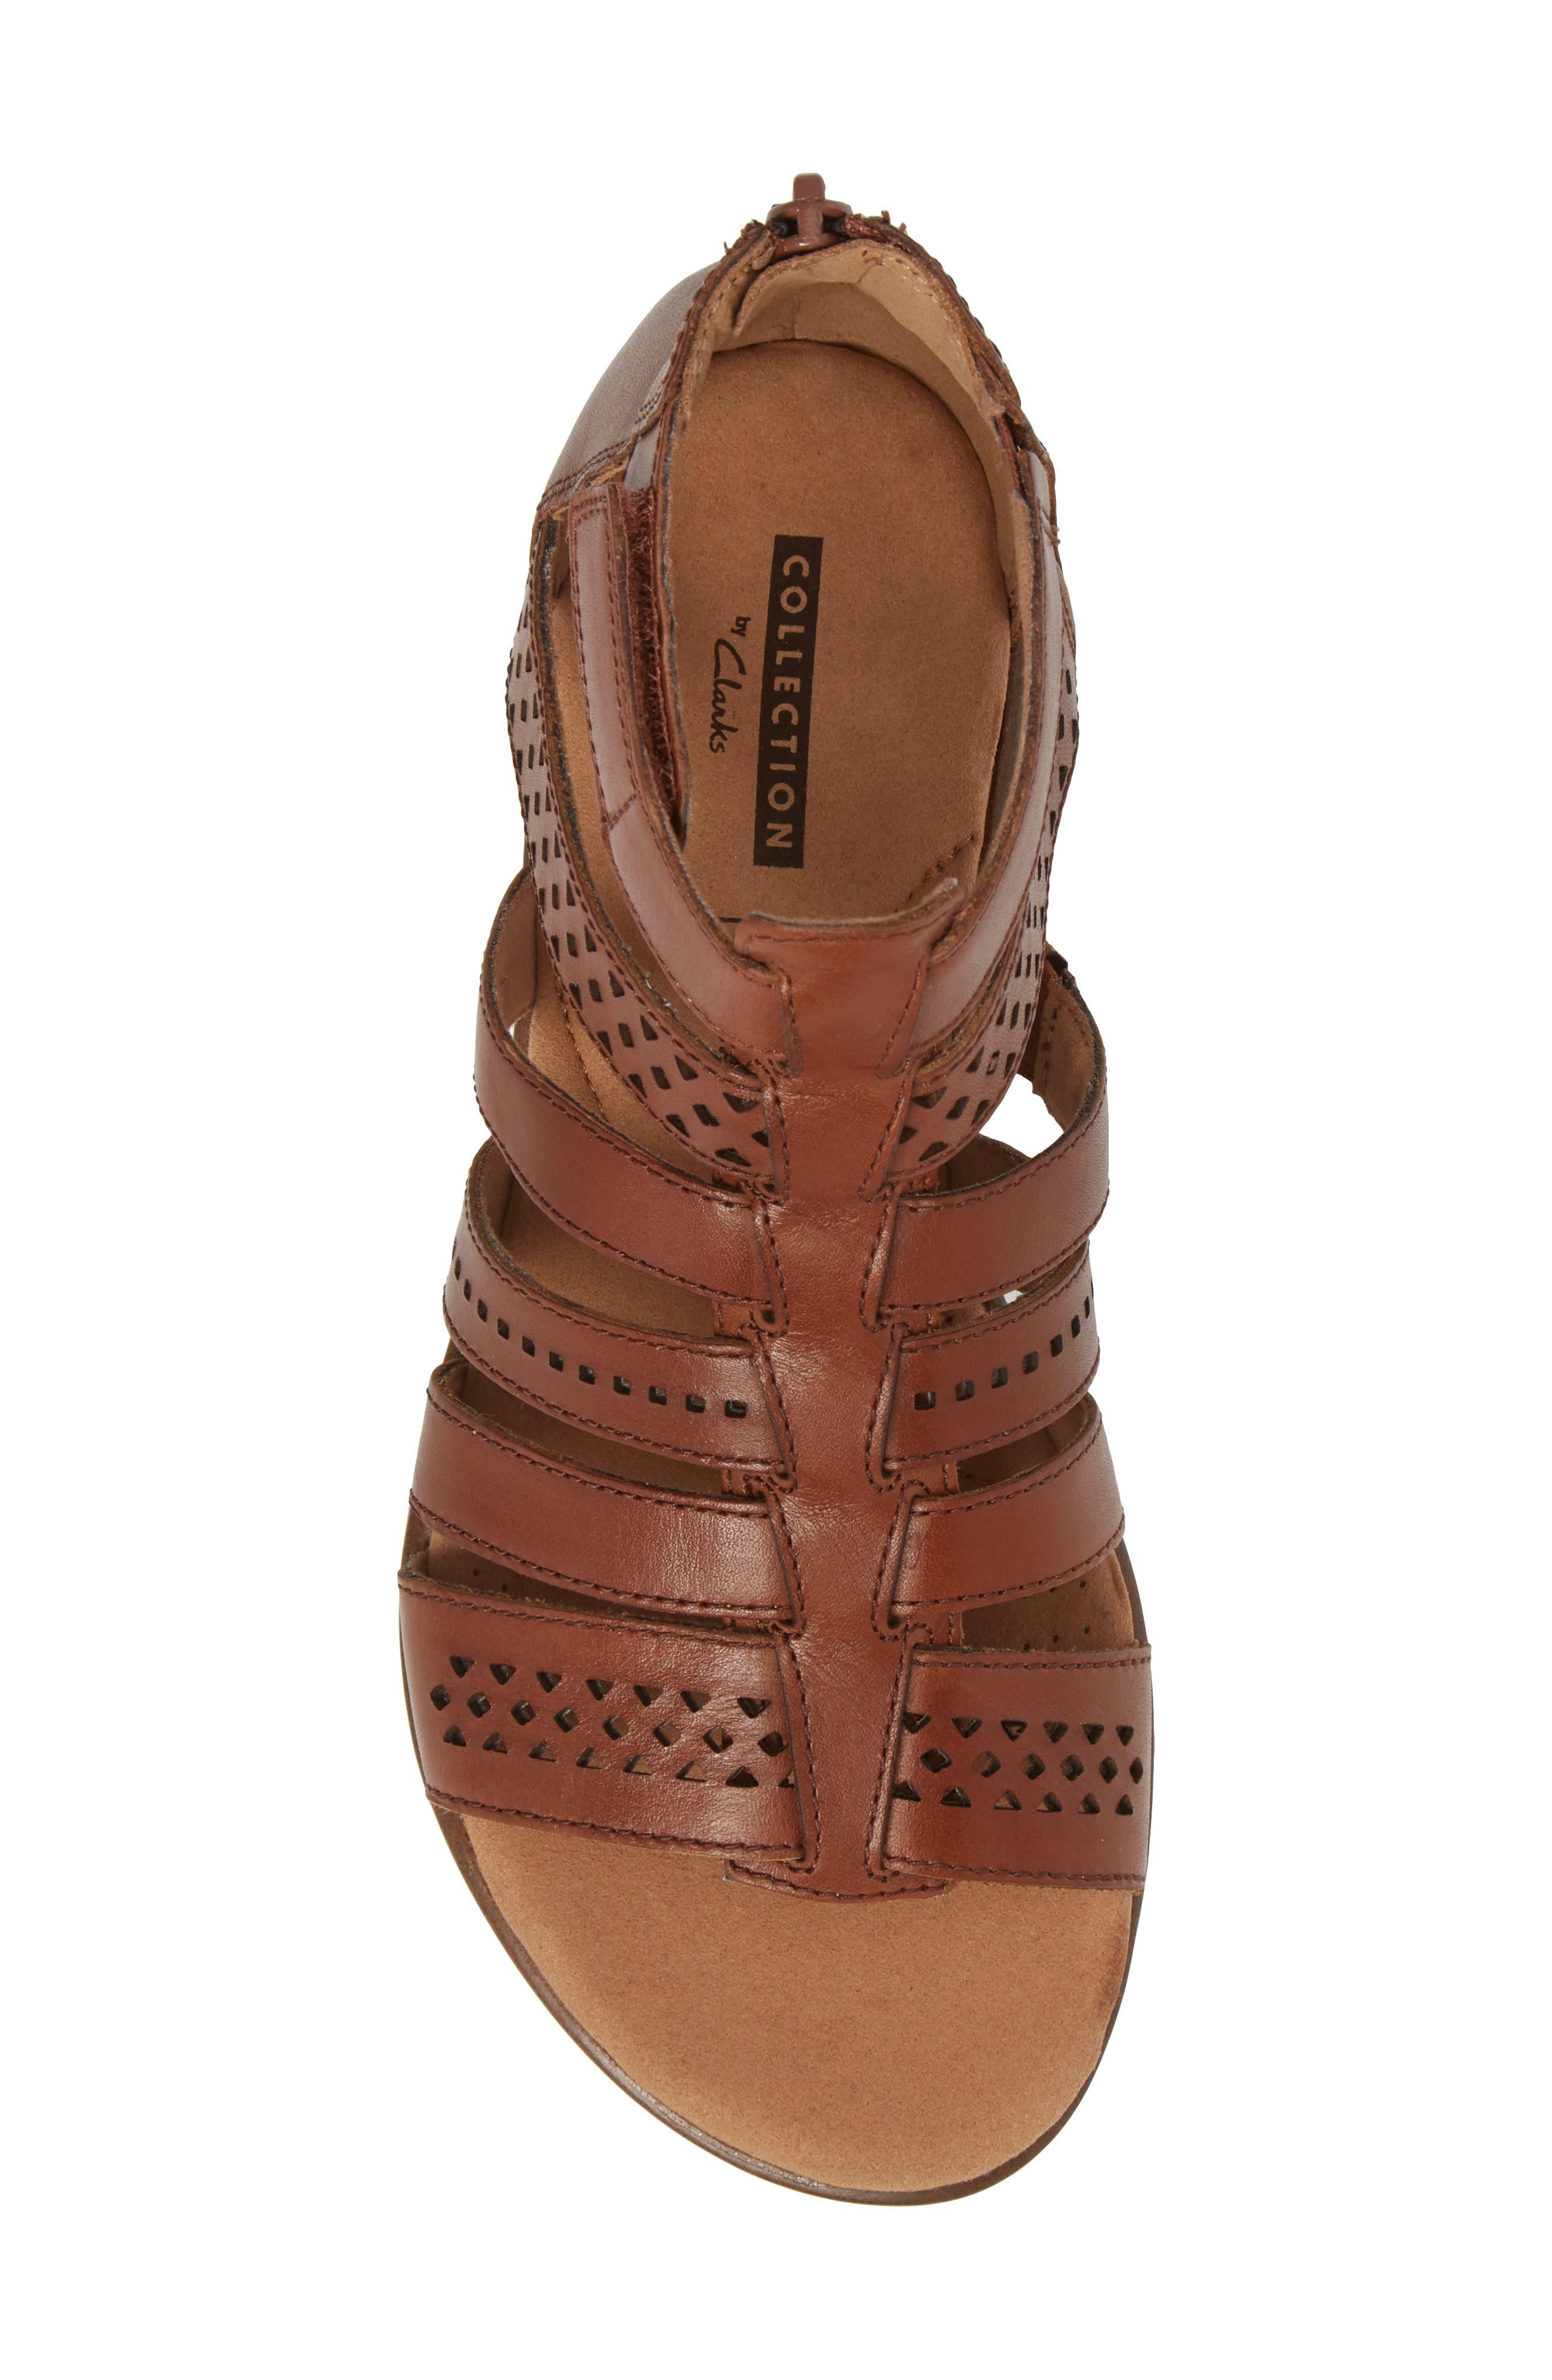 Kele Lotus Sandal,                             Alternate thumbnail 5, color,                             Beige Leather